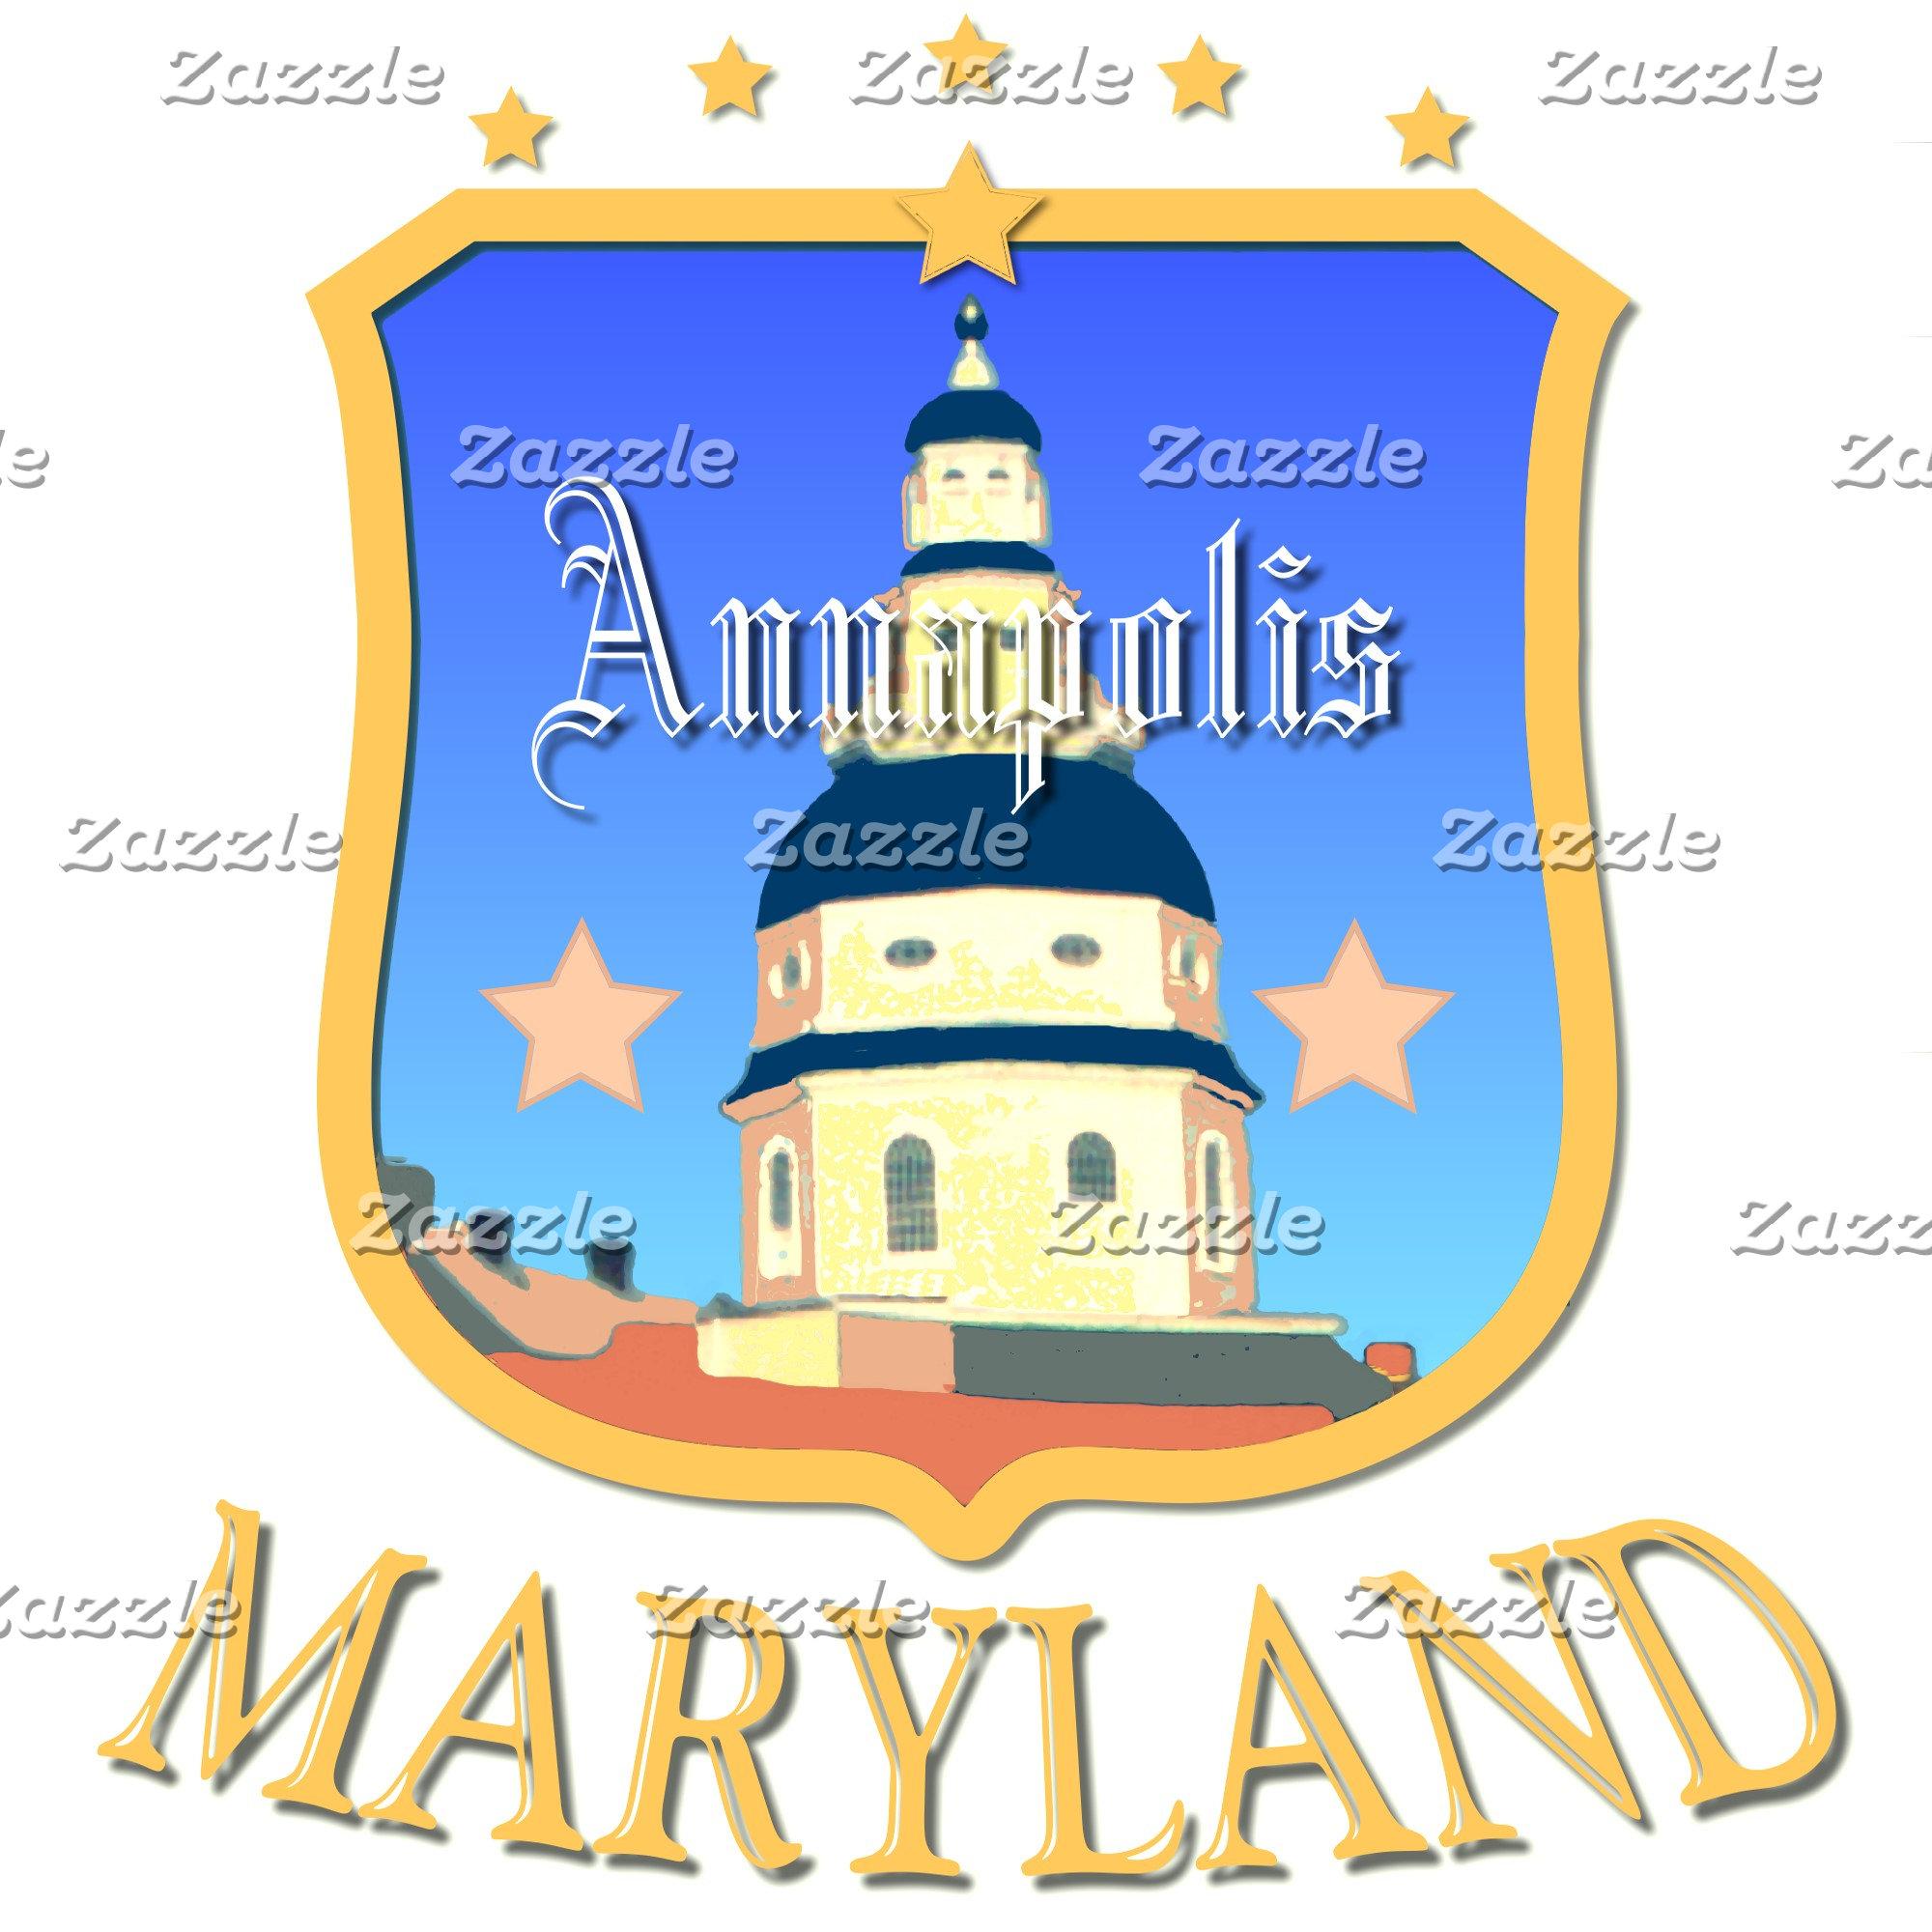 Annapolis Maryland T-shirts